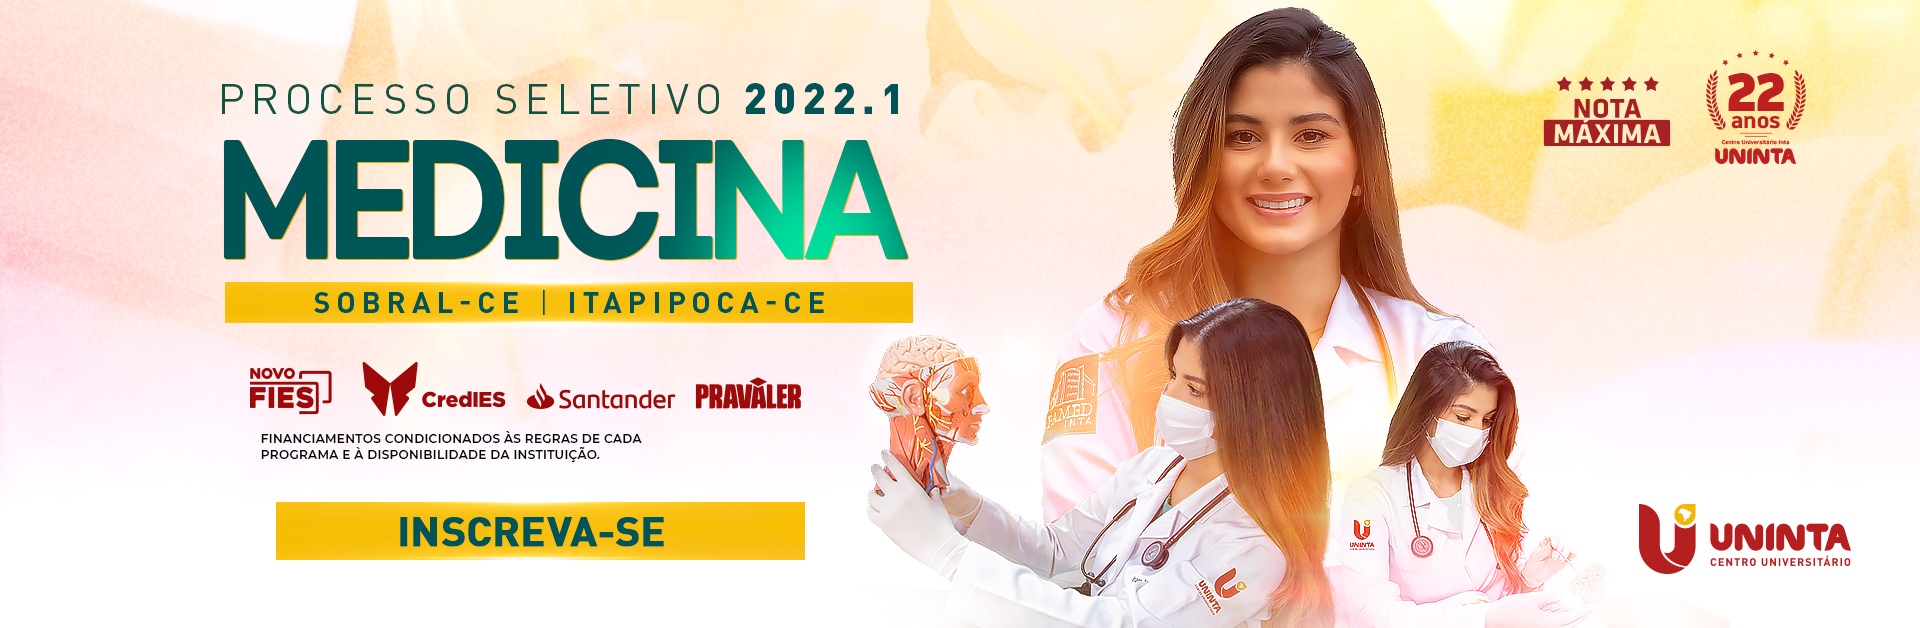 BANNER-HOME—Processo-Seletivo-Medicina-2022